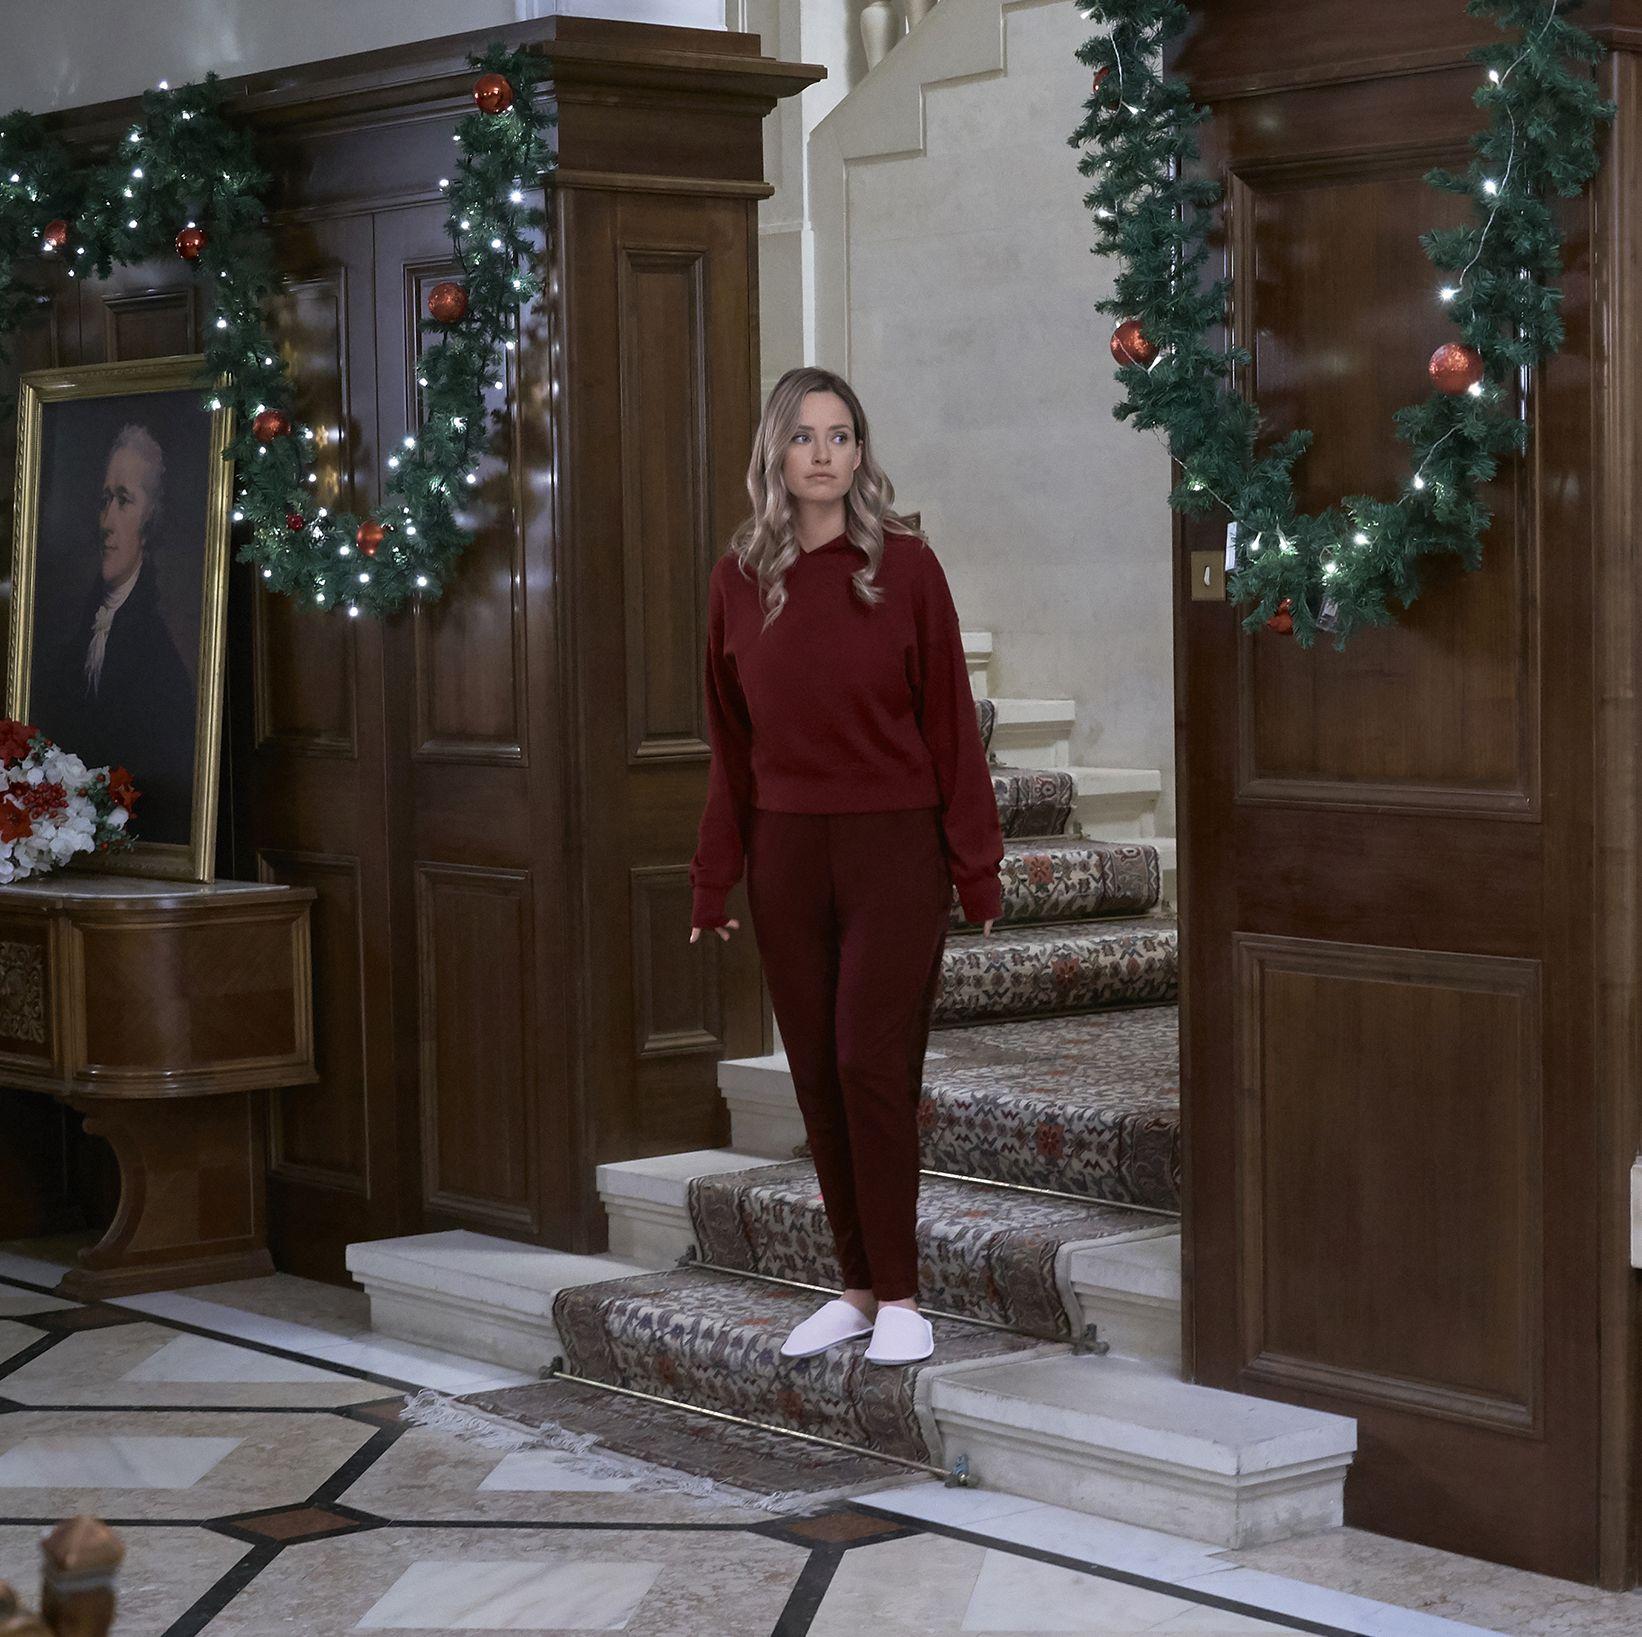 Christmas Prince Cast >> Here's Where Hallmark's 'Christmas at the Palace' Movie Was Filmed